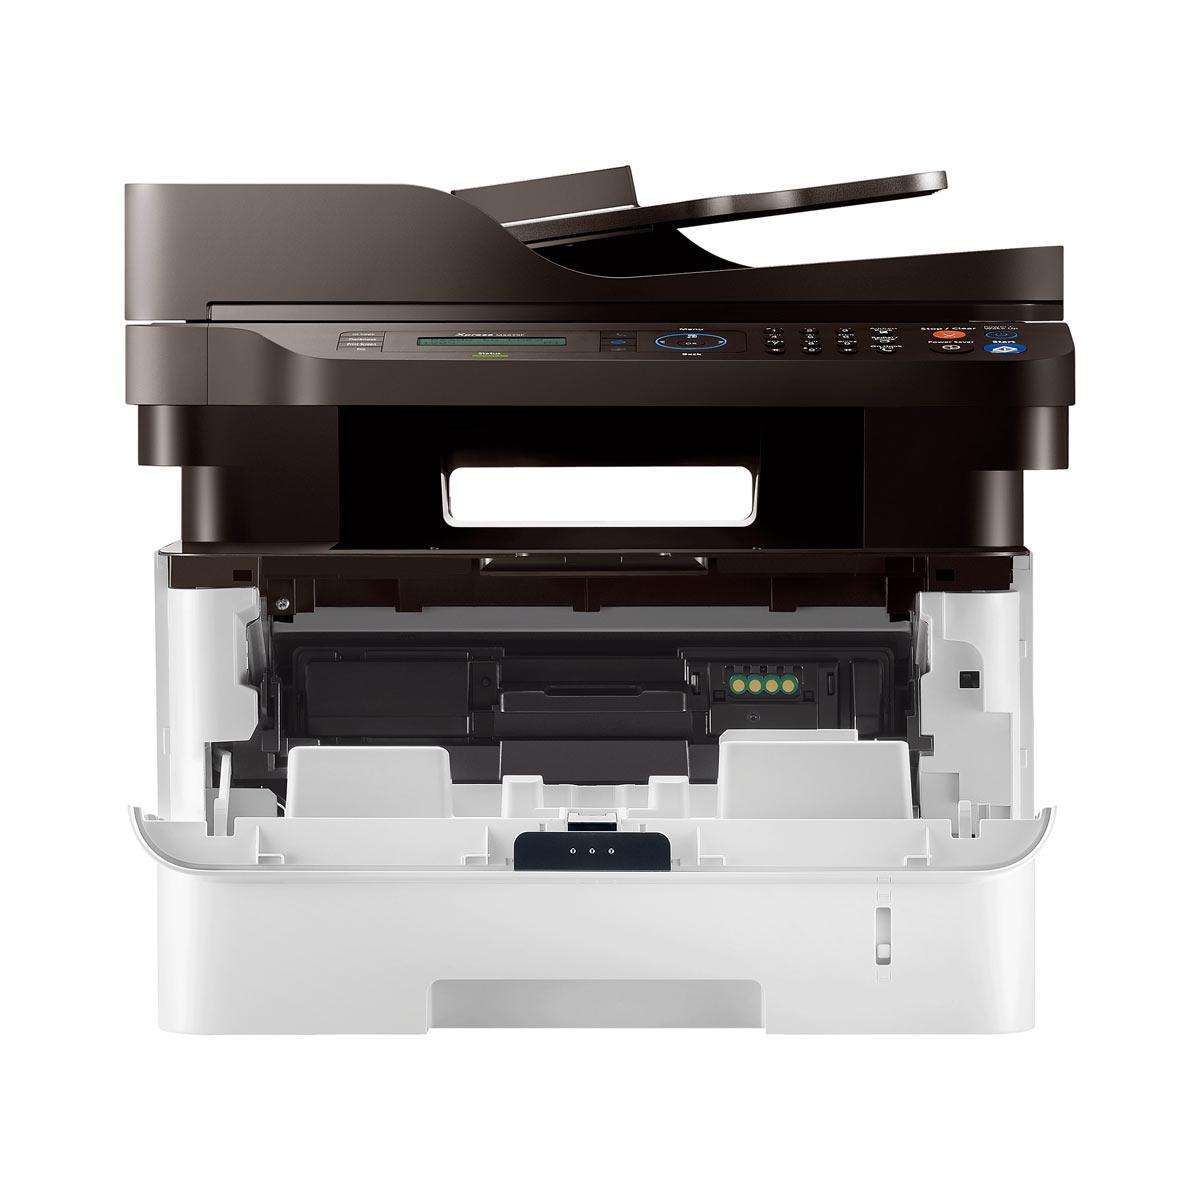 Imprimante multifonction Samsung SL-M2675FN - Cybertek.fr - 3